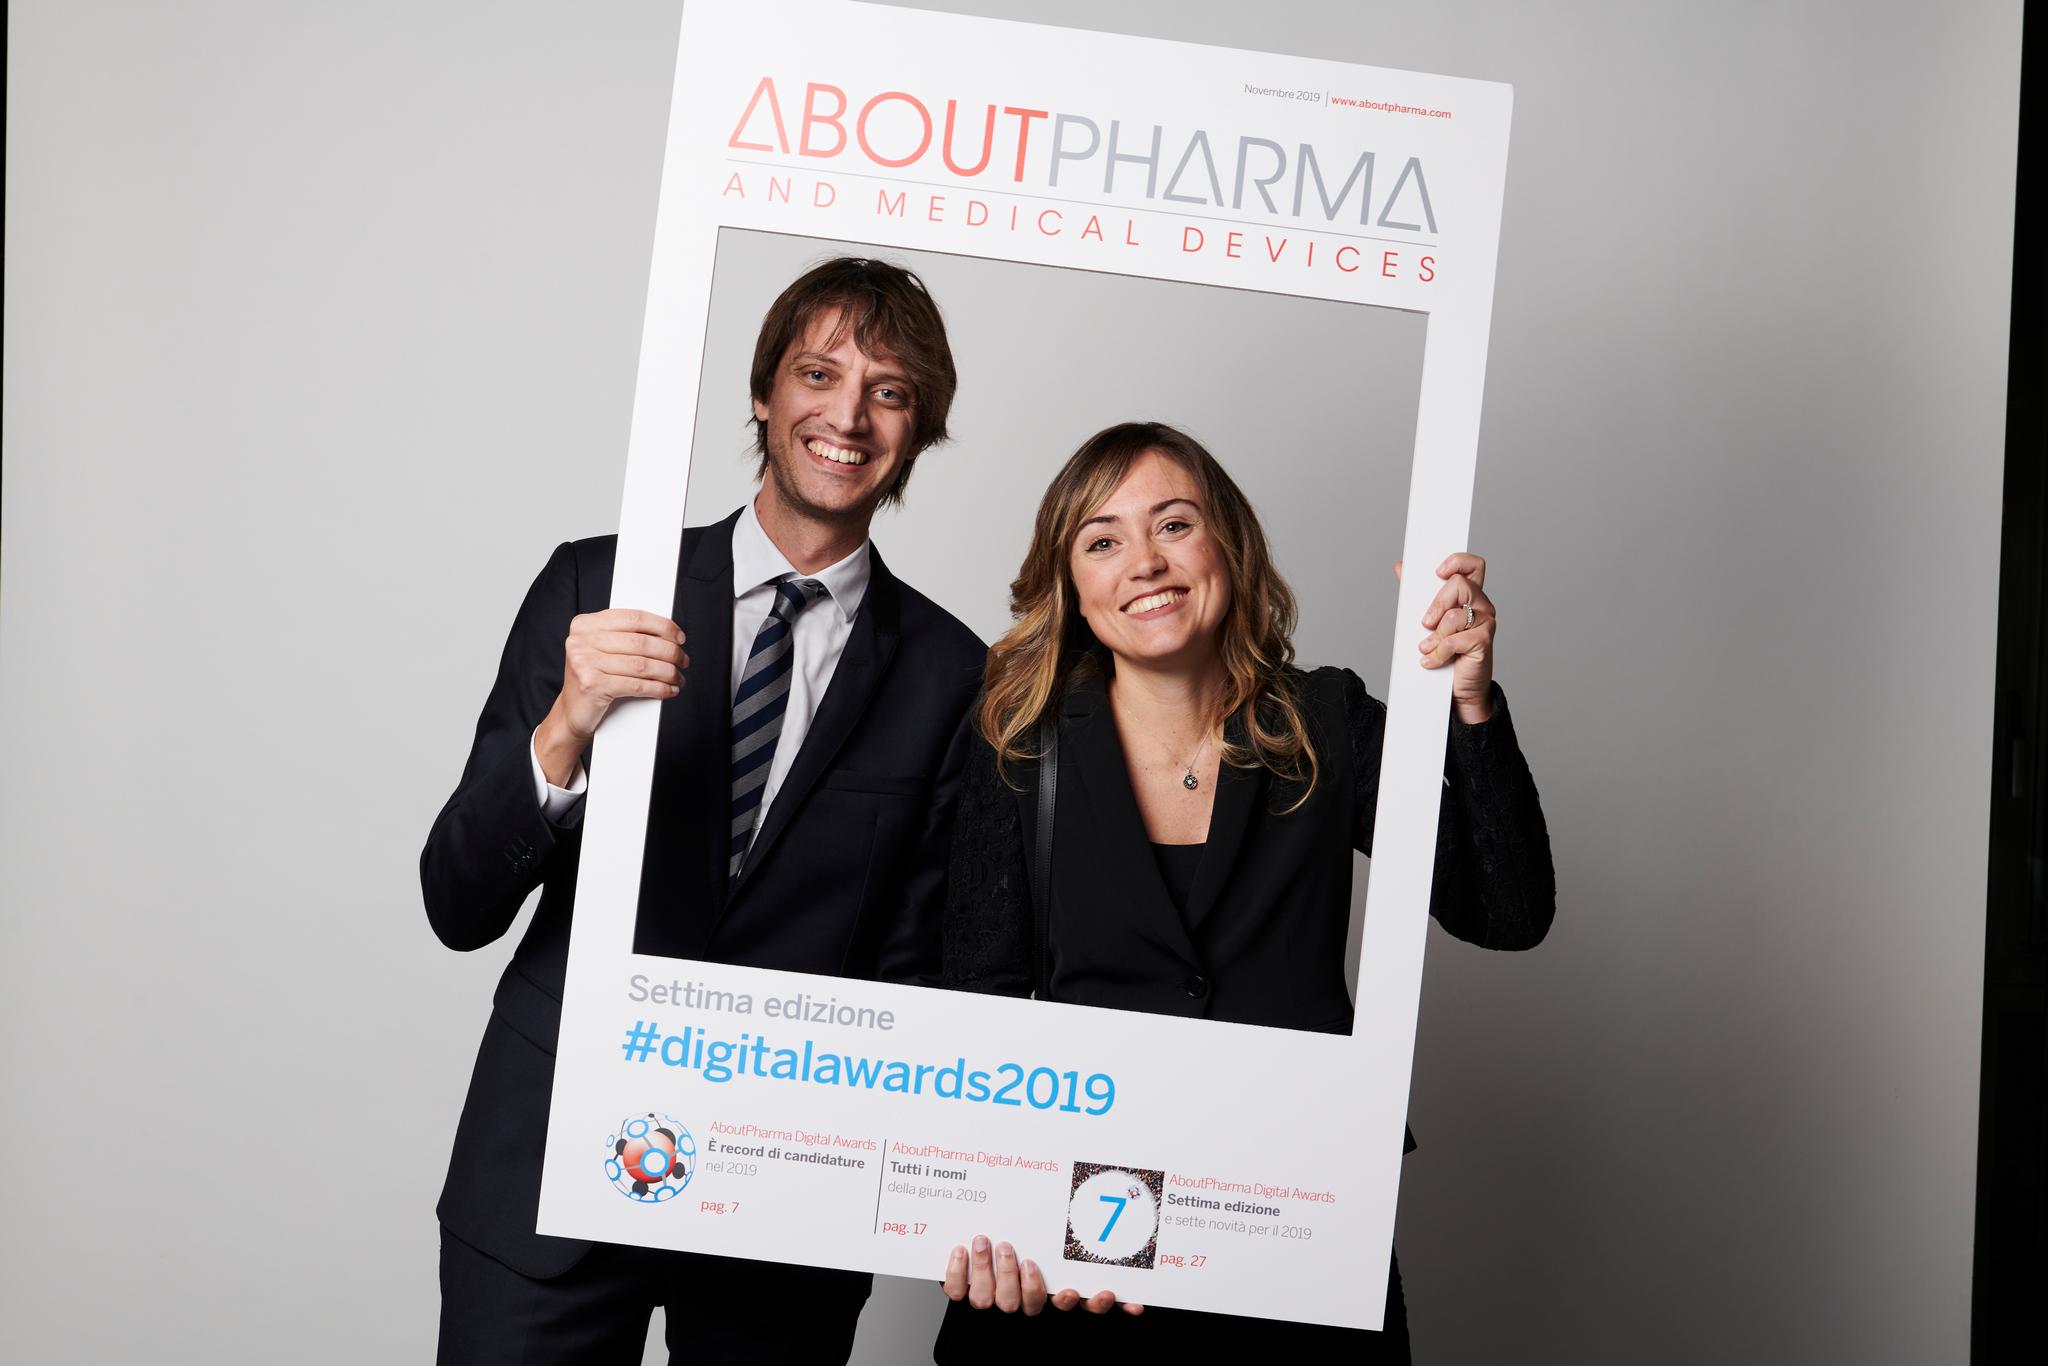 Photobooth AboutPharma Digital Awards 2019_149